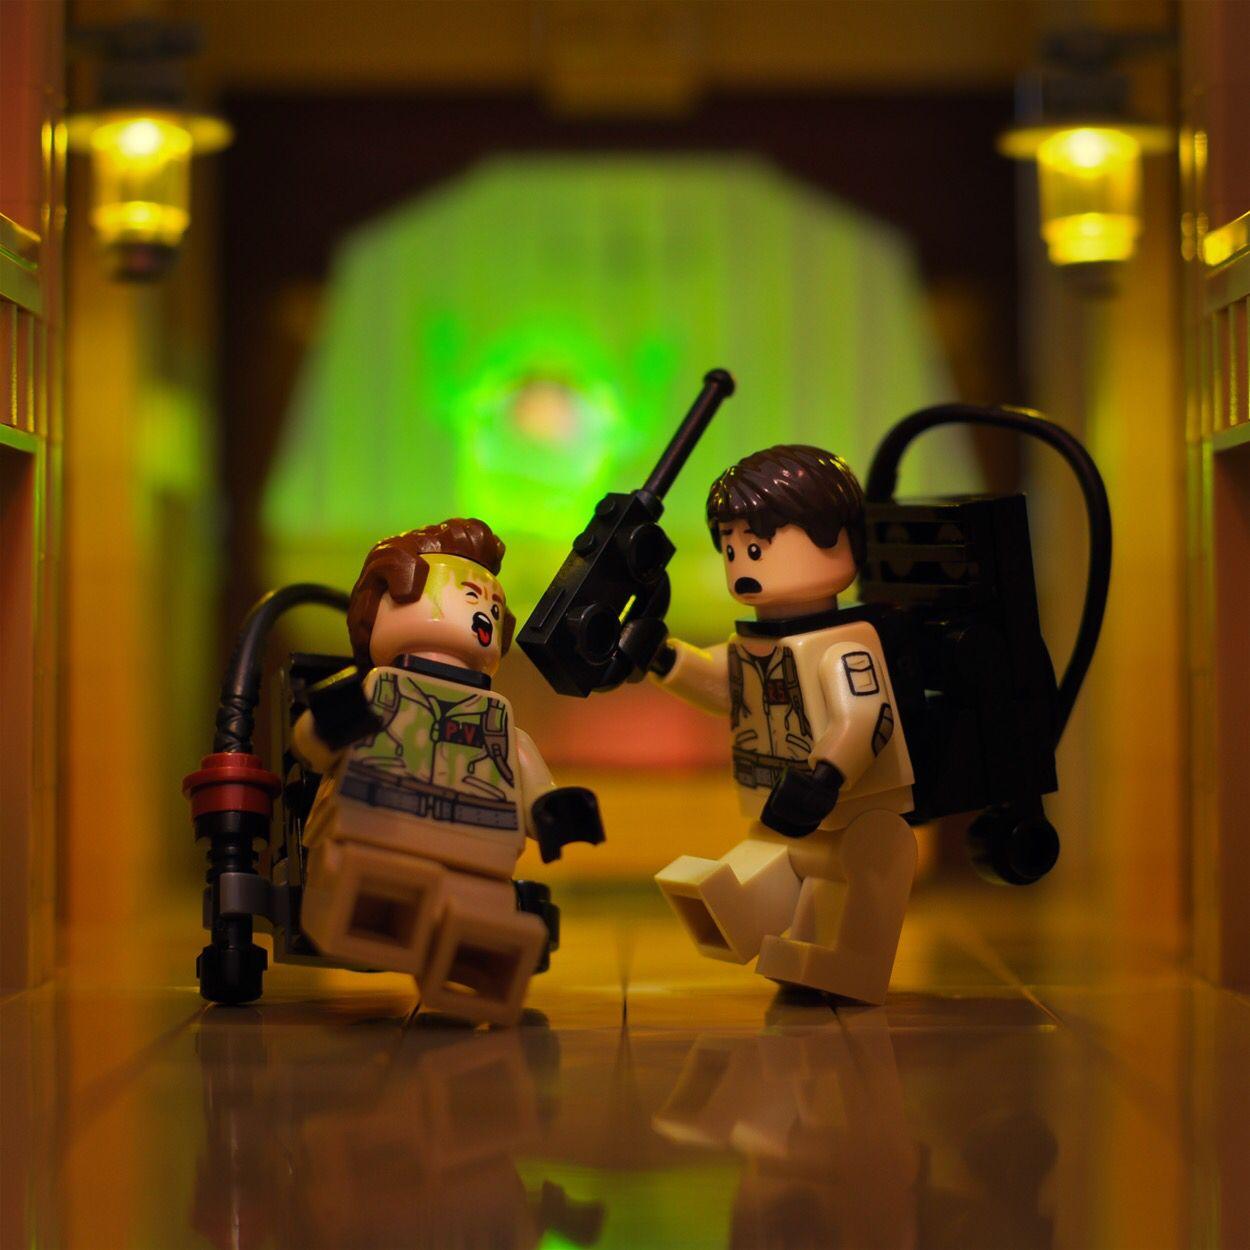 Who Ya Gonna Call Ghostbusters In Lego Amazing Lego Creations Lego Design Lego Photo